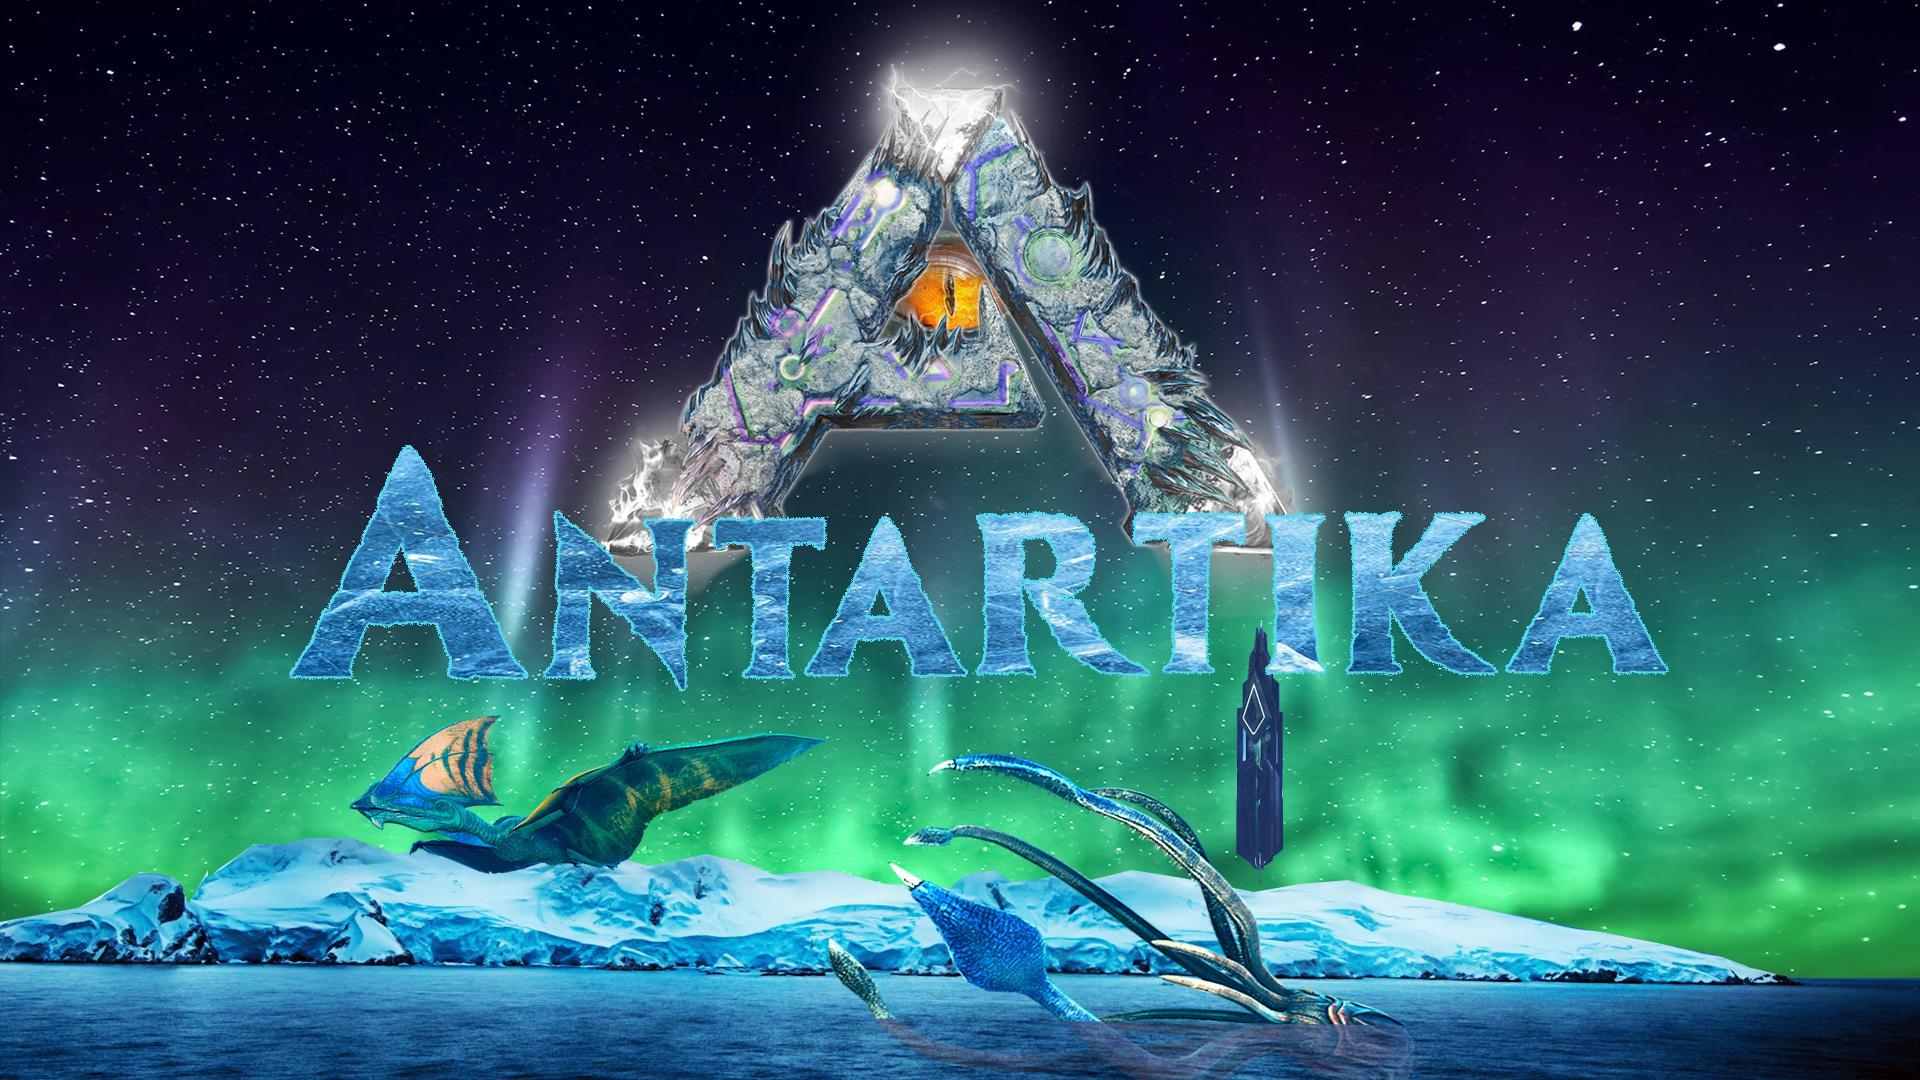 ARK Sponsored Mods - ARK - Official Community Forums